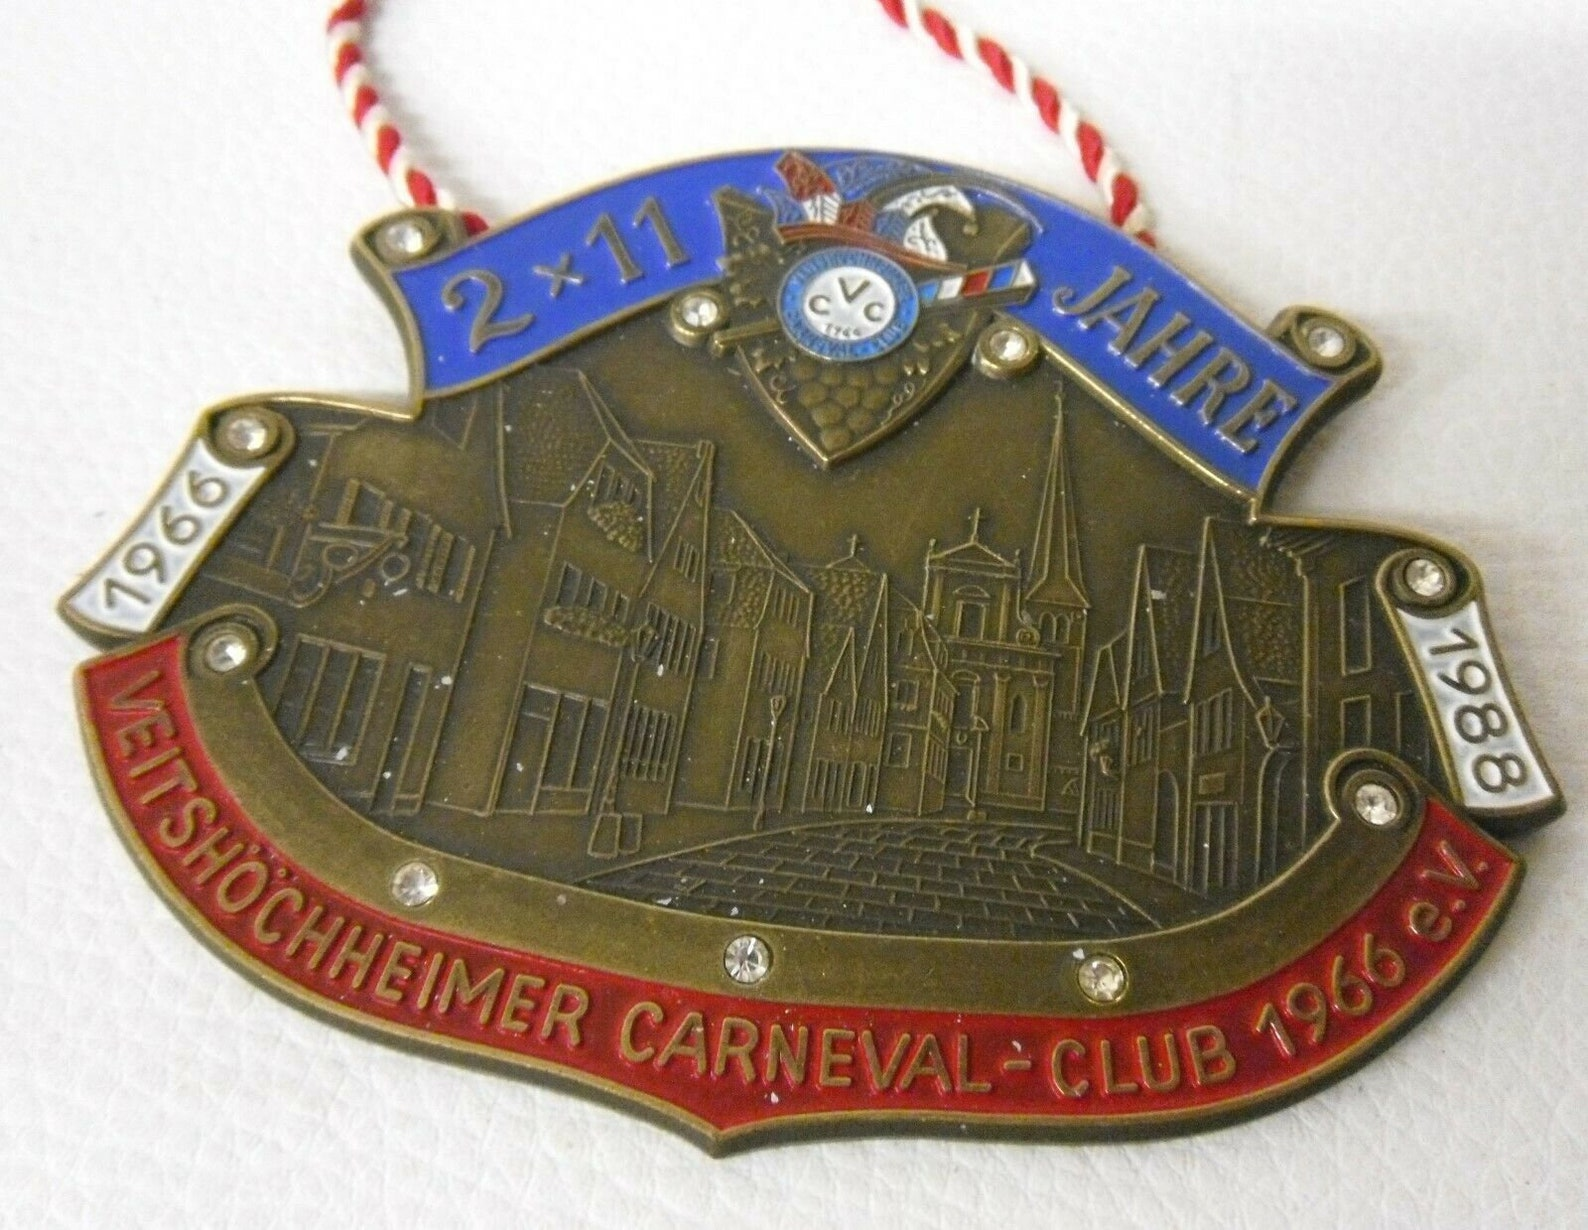 Old Carnival Order - Veitschöchheimer Carneval Club 1988